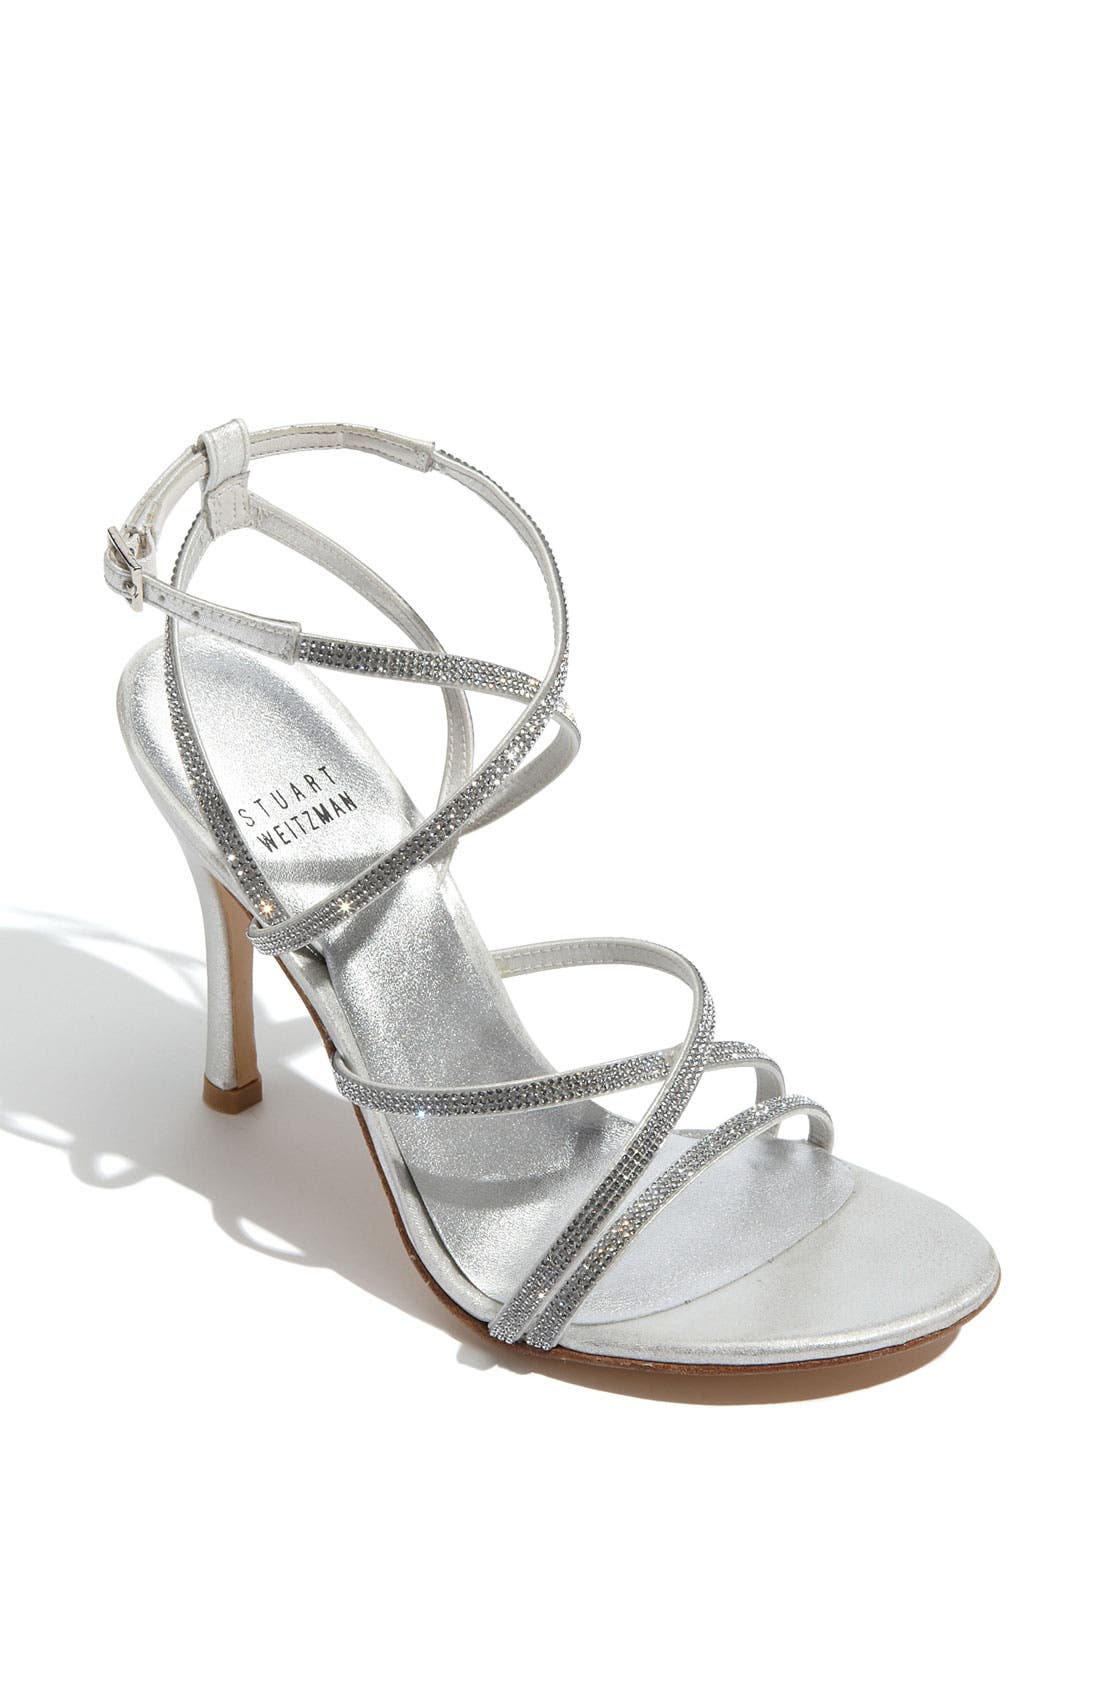 Main Image - Stuart Weitzman 'Gemex' Sandal